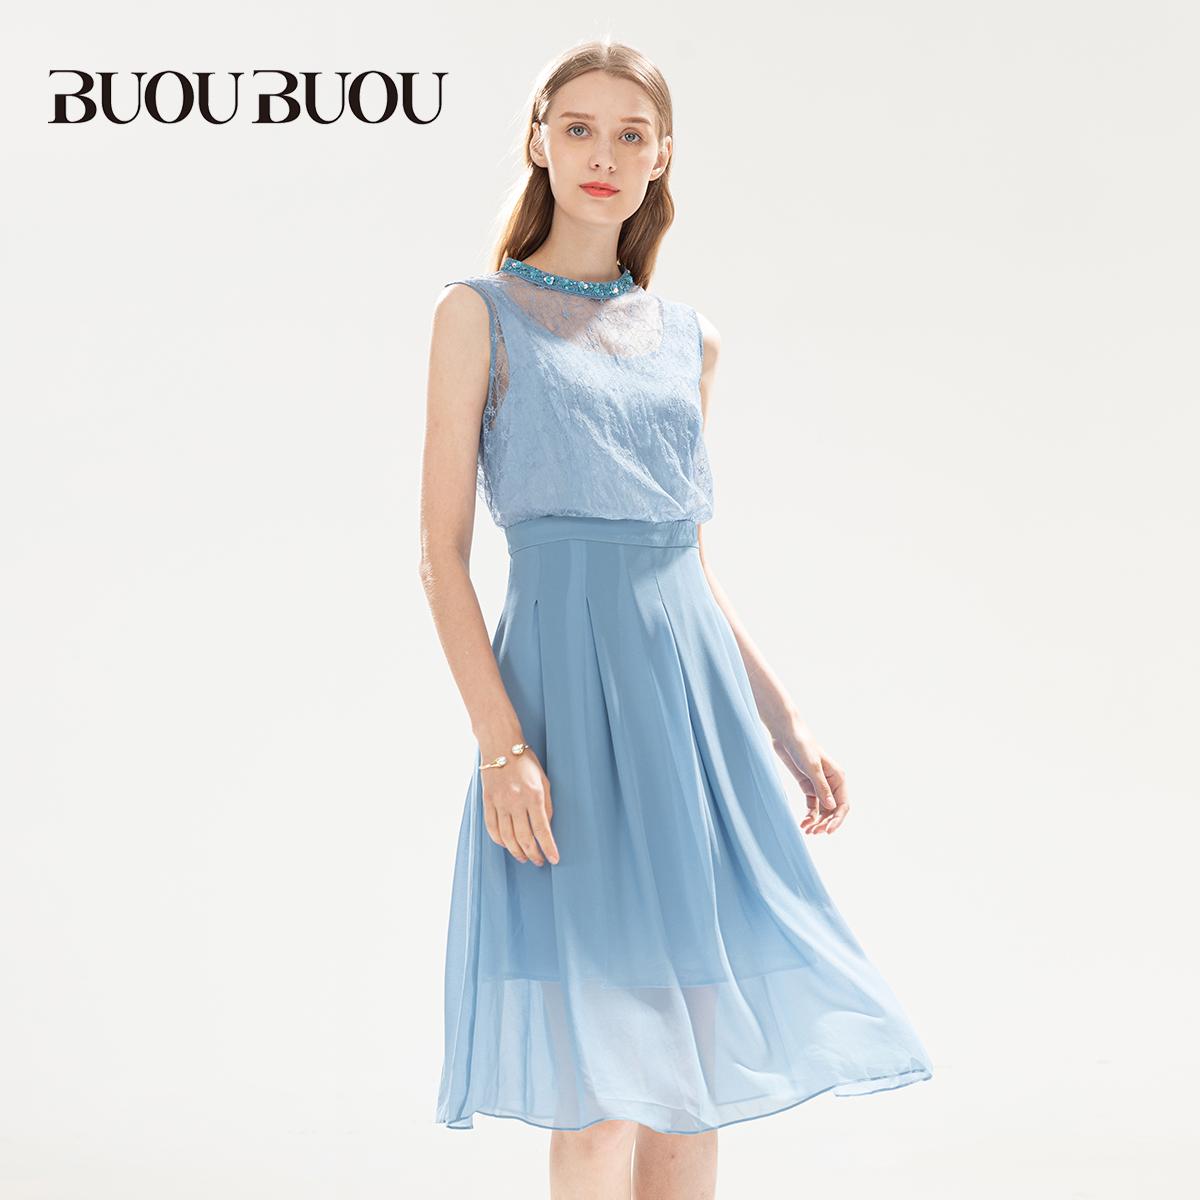 BUOUBUOU女装夏季清仓折扣钉珠蕾丝拼接连衣裙DE2G081